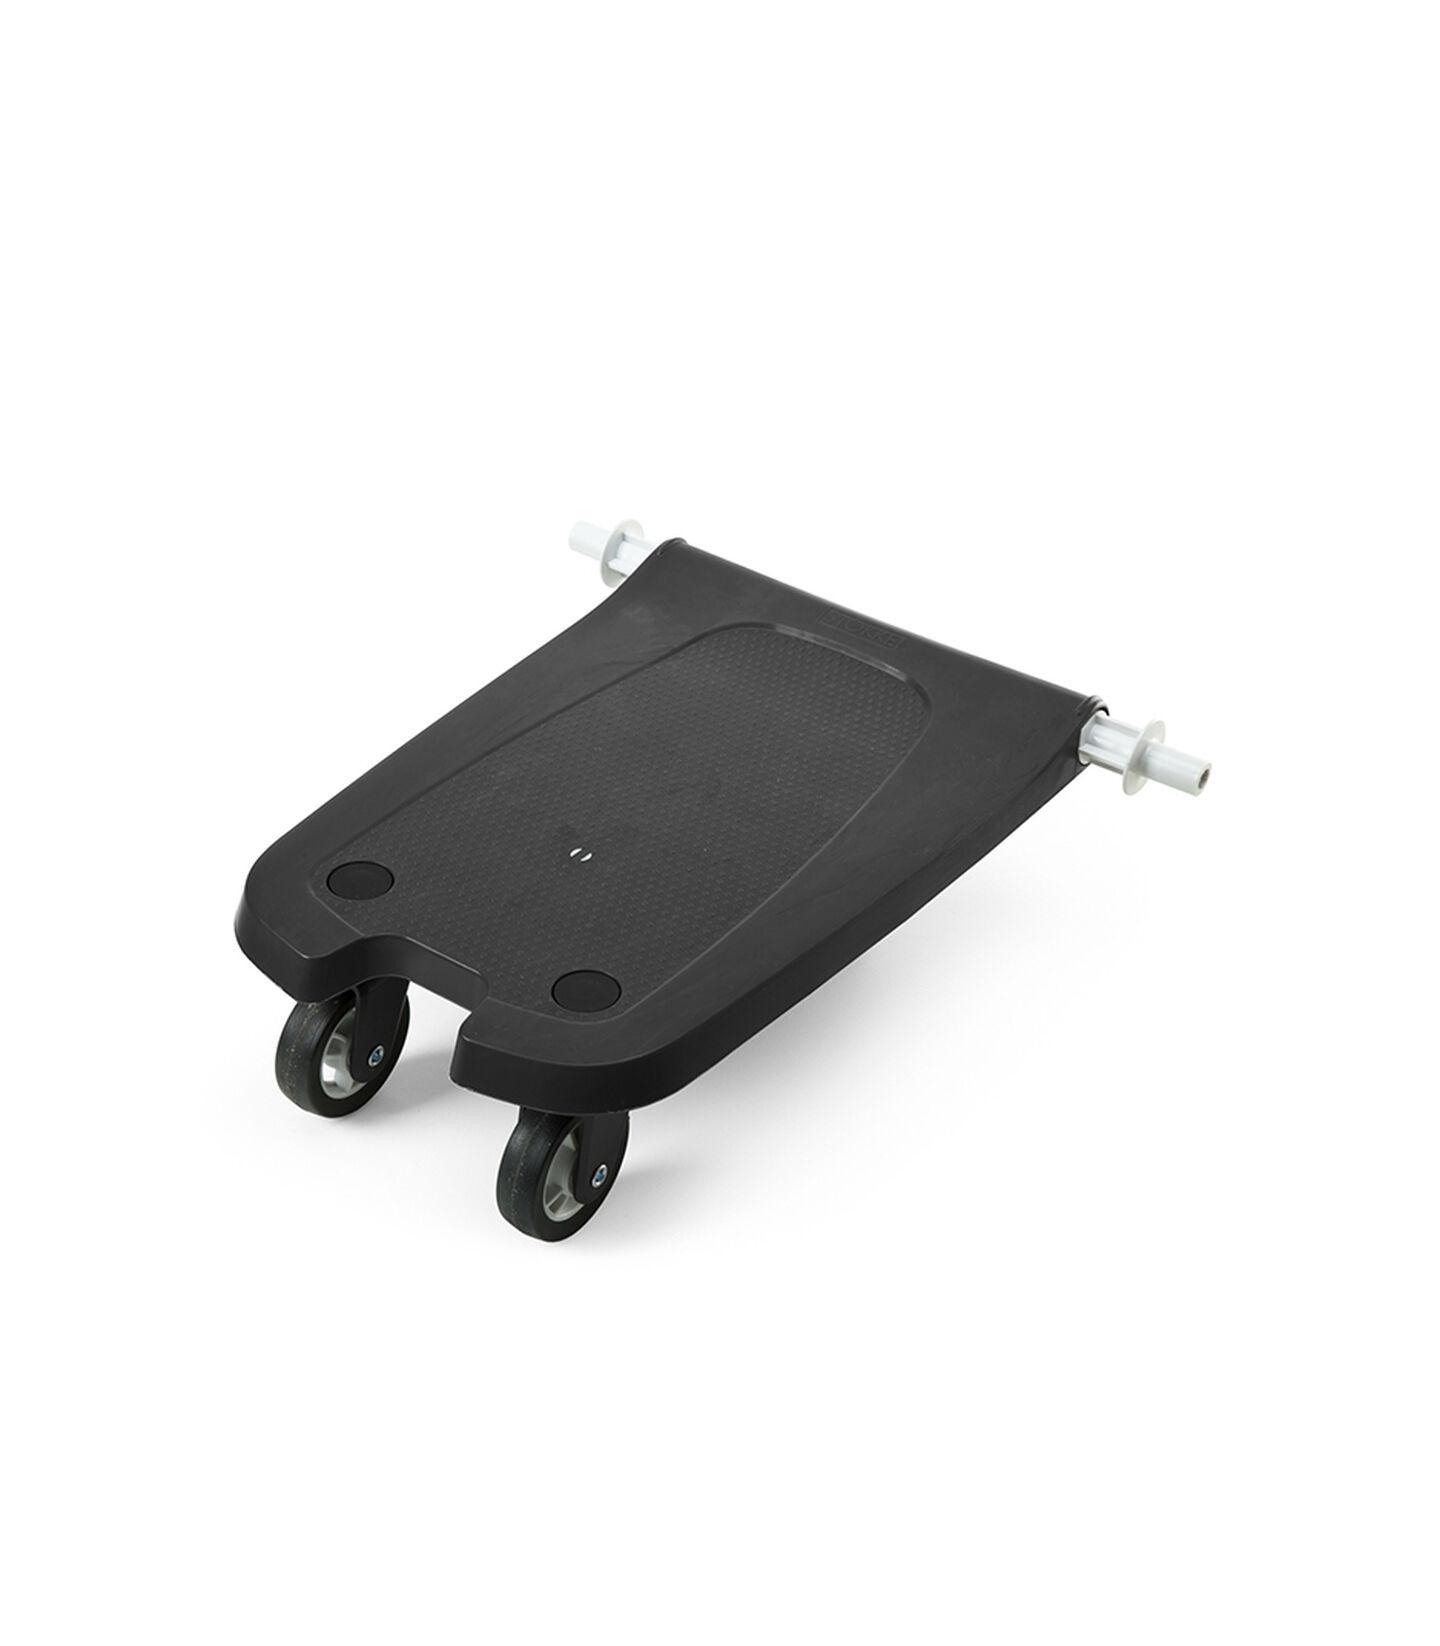 Stokke® Xplory® Sibling Board Black. Accessories.